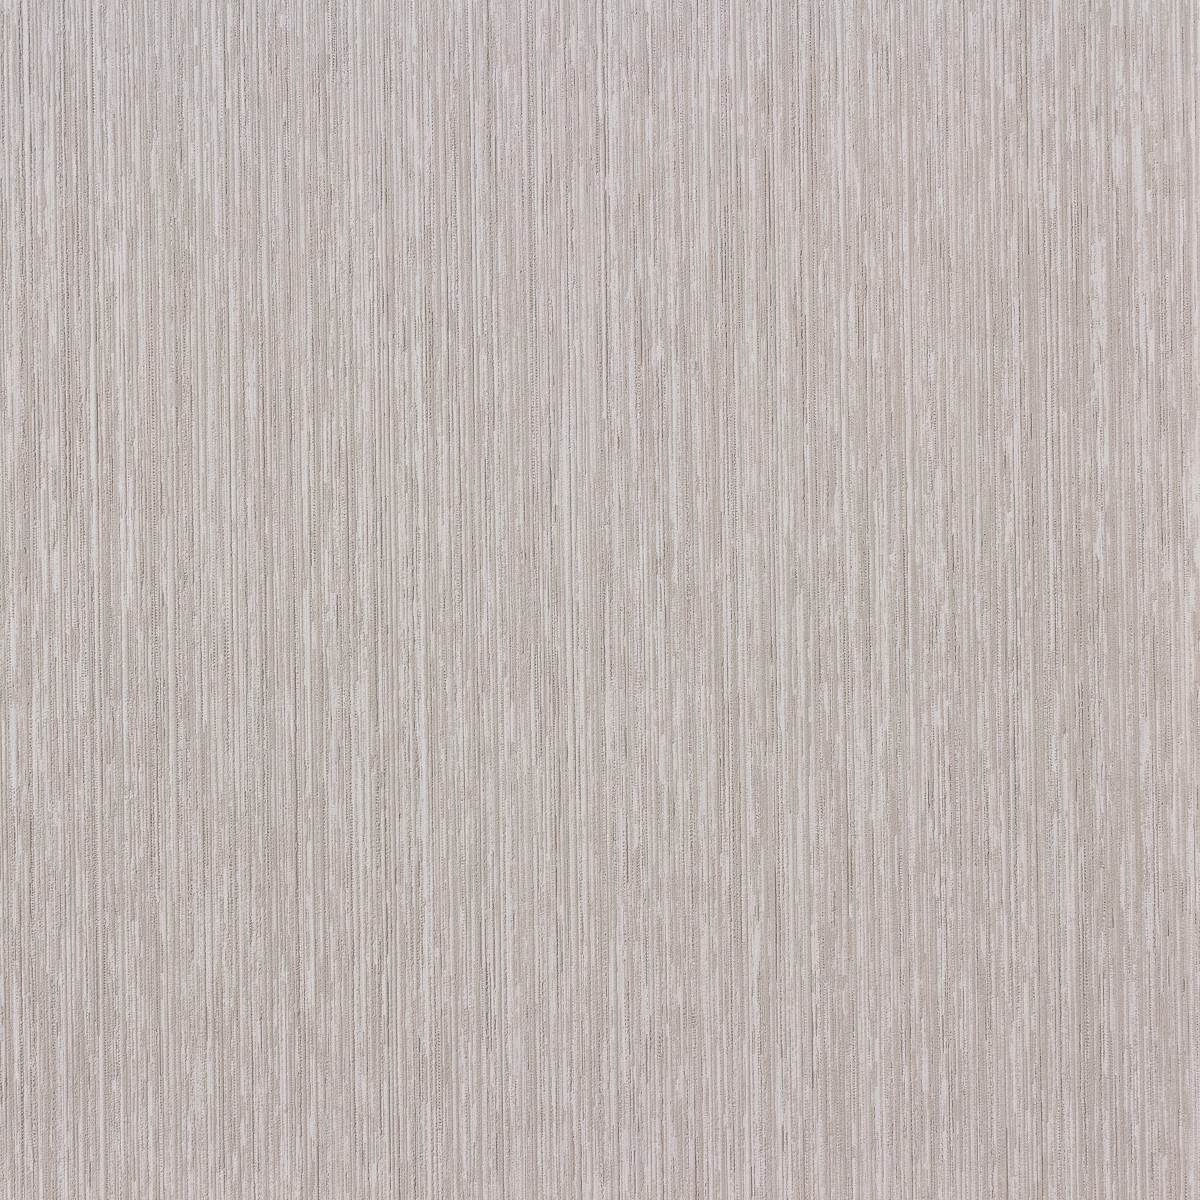 wallpaper ornament non woven wallpaper p s 13112 30 1311230 plain cream beige. Black Bedroom Furniture Sets. Home Design Ideas